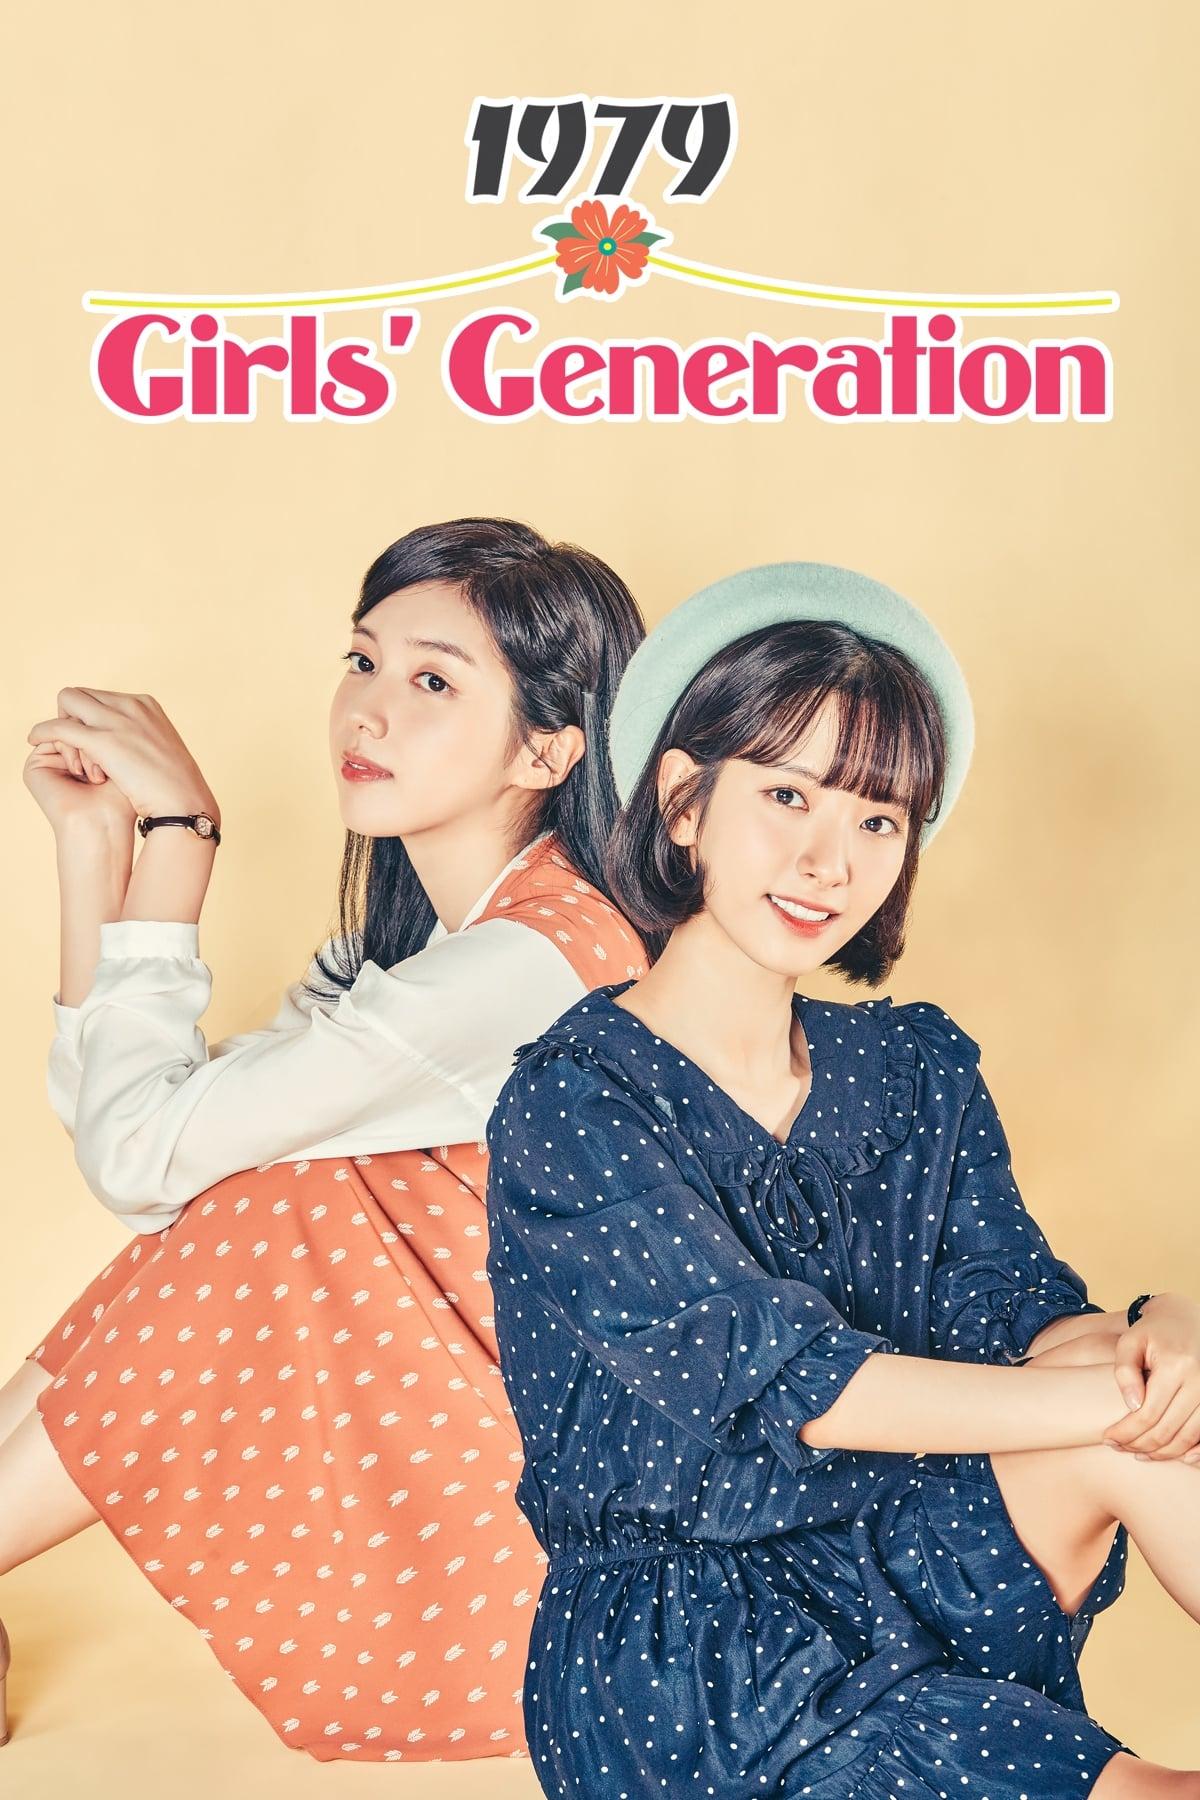 Girls' Generation 1979